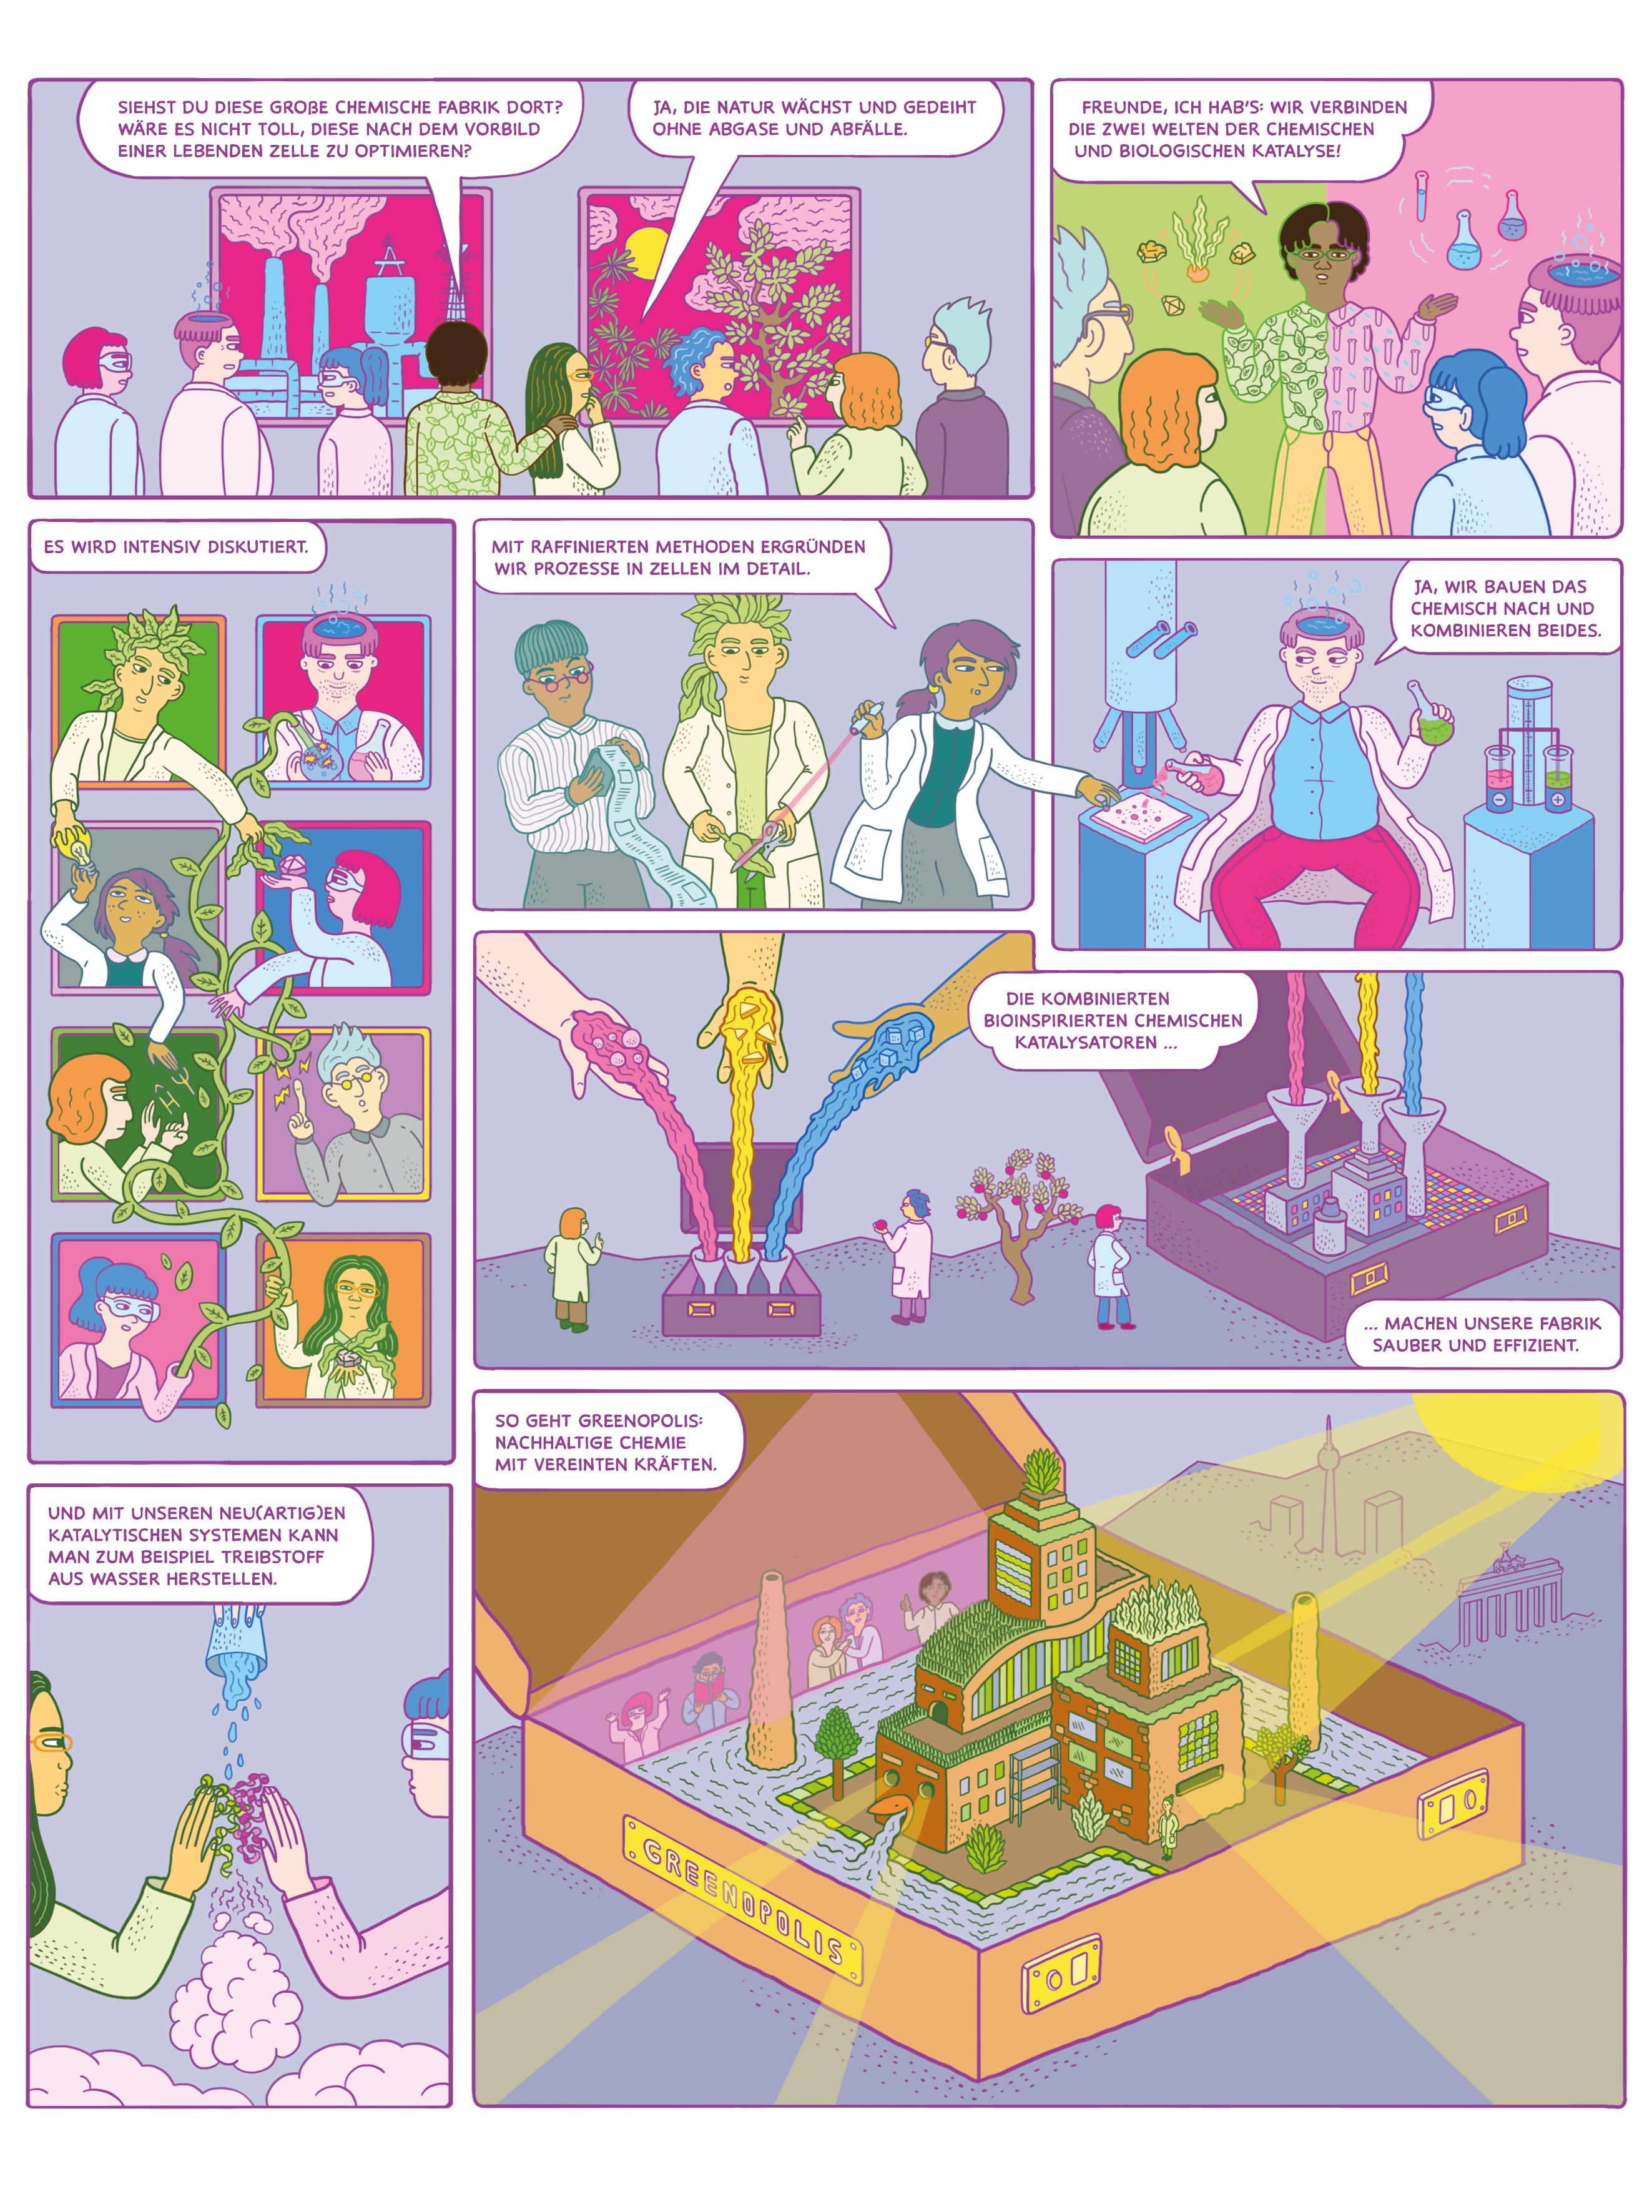 http://rahelsuesskind.de/wp-content/uploads/2020/04/TU_Comic_Groß.png